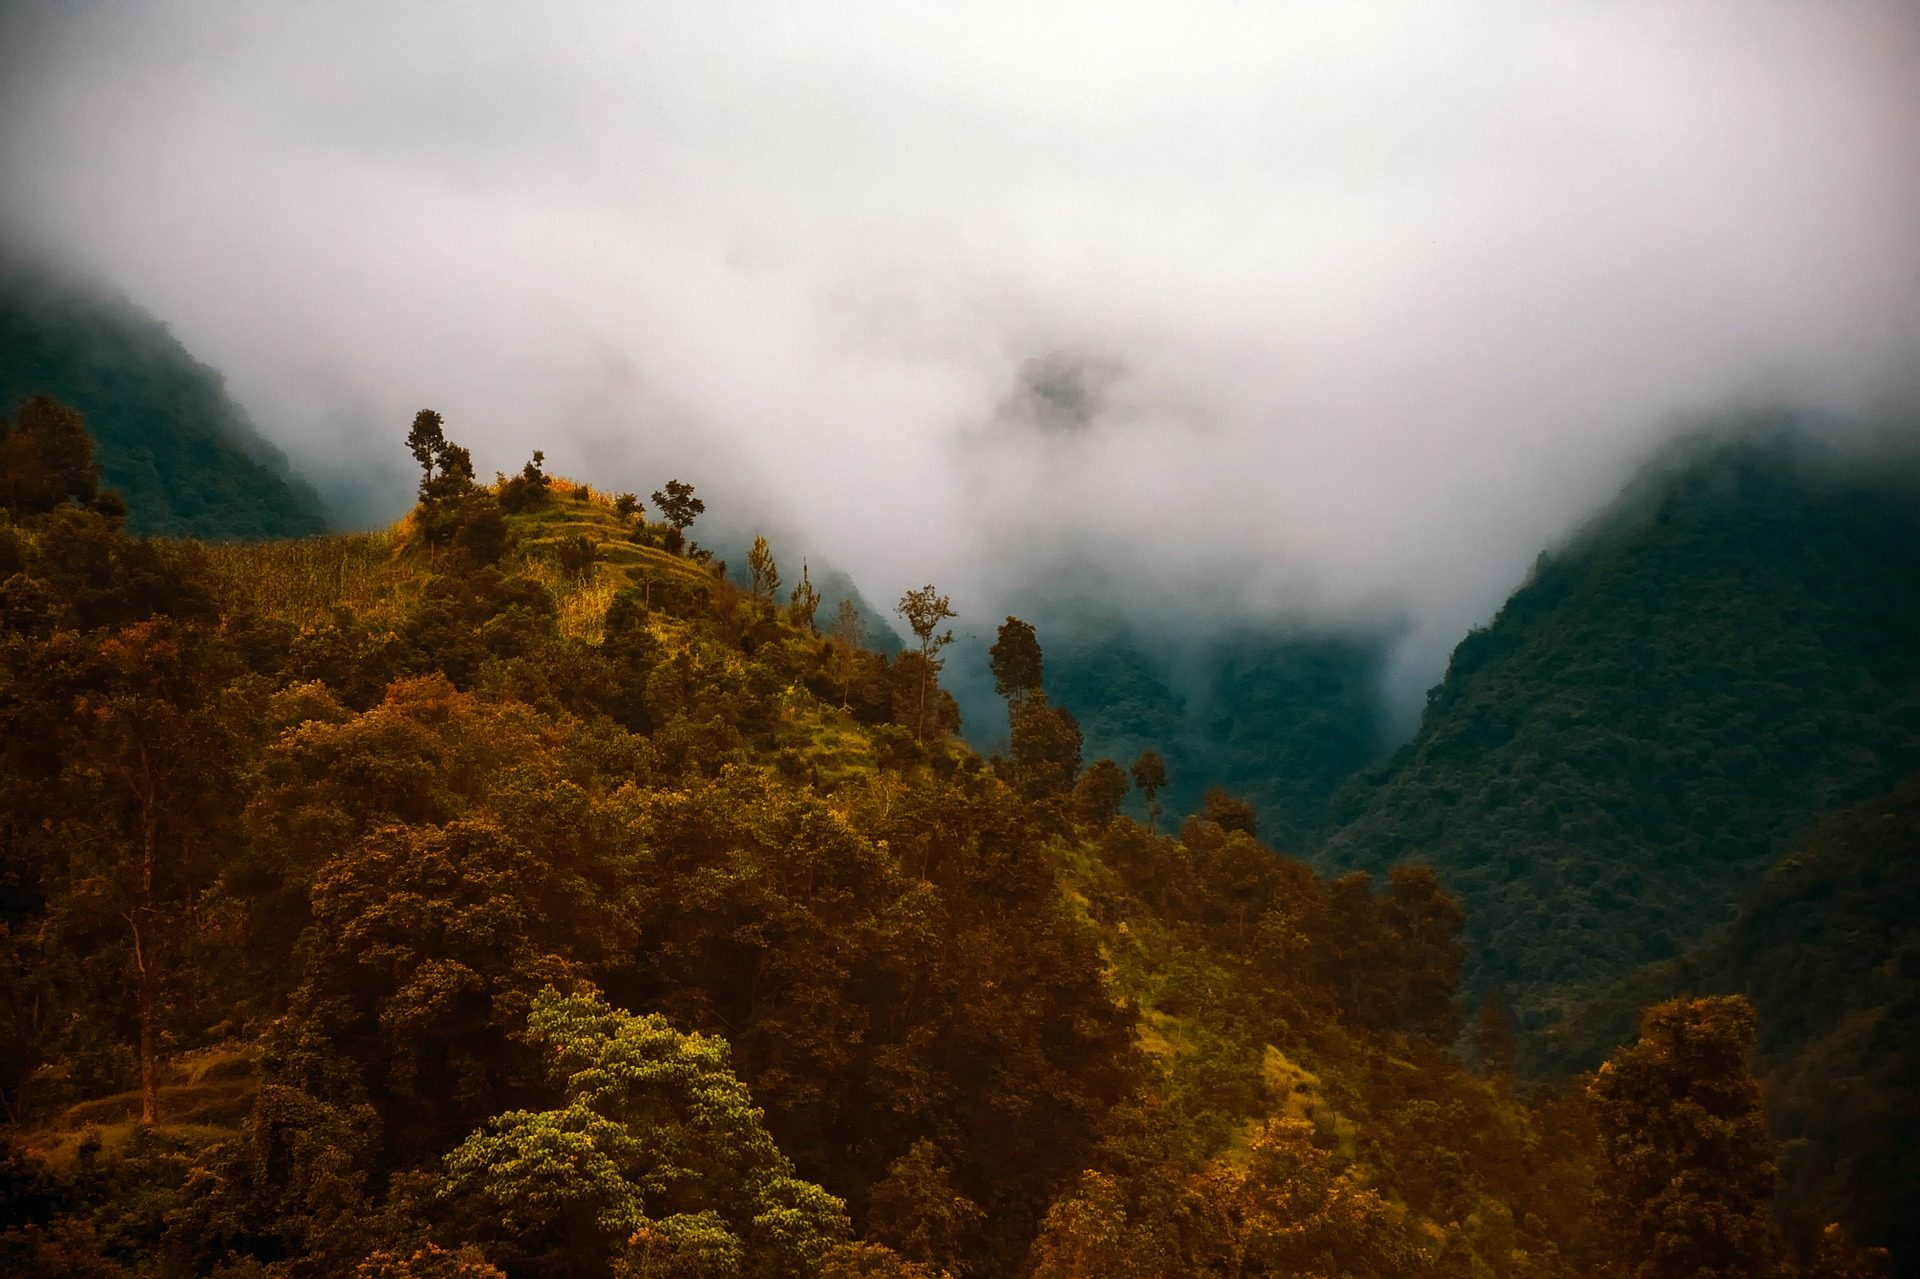 Montañas, valles, βλάστηση, δέντρα, ομίχλη, Νεπάλ - Wallpapers HD - Professor-falken.com